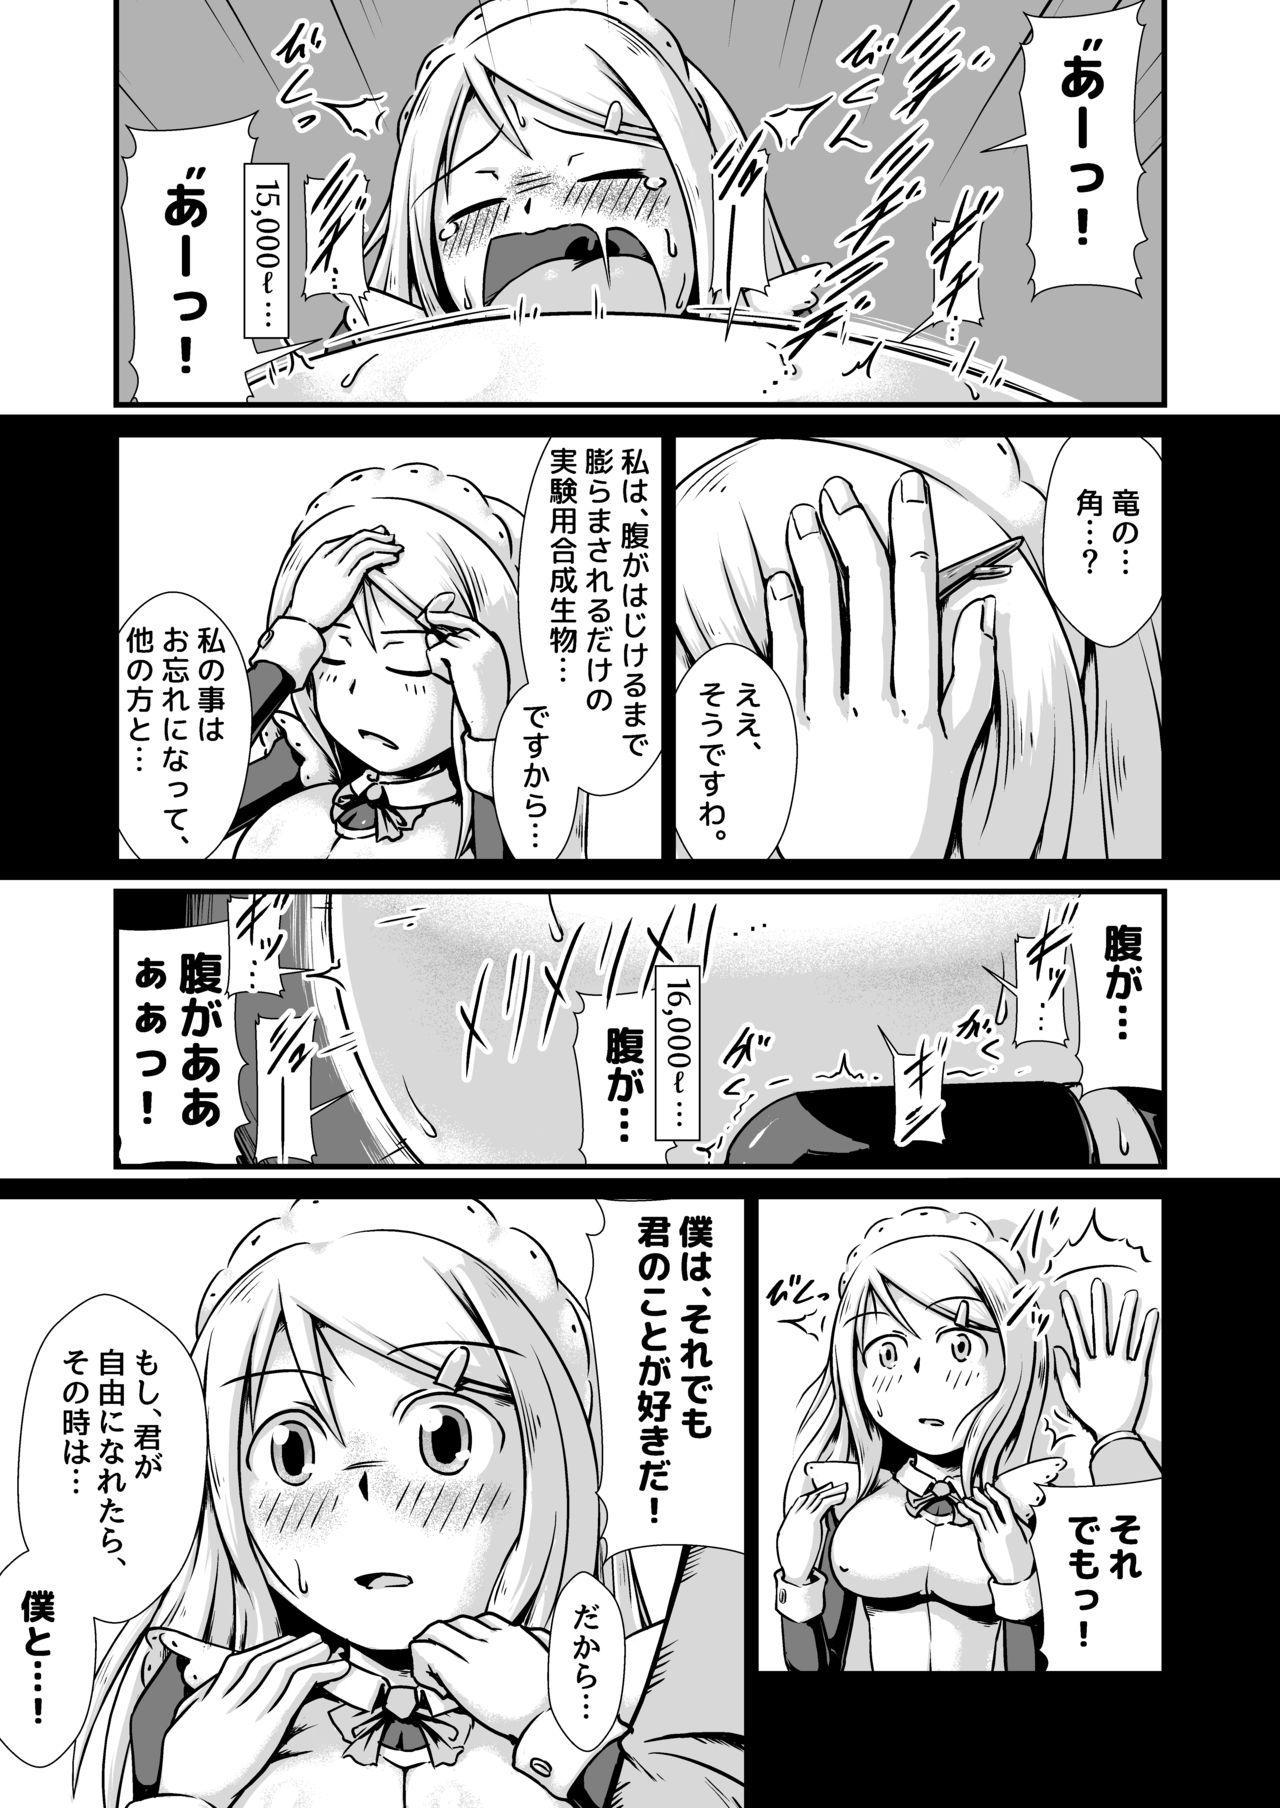 Maid-san Boufuku Taikyuu Jikken 12